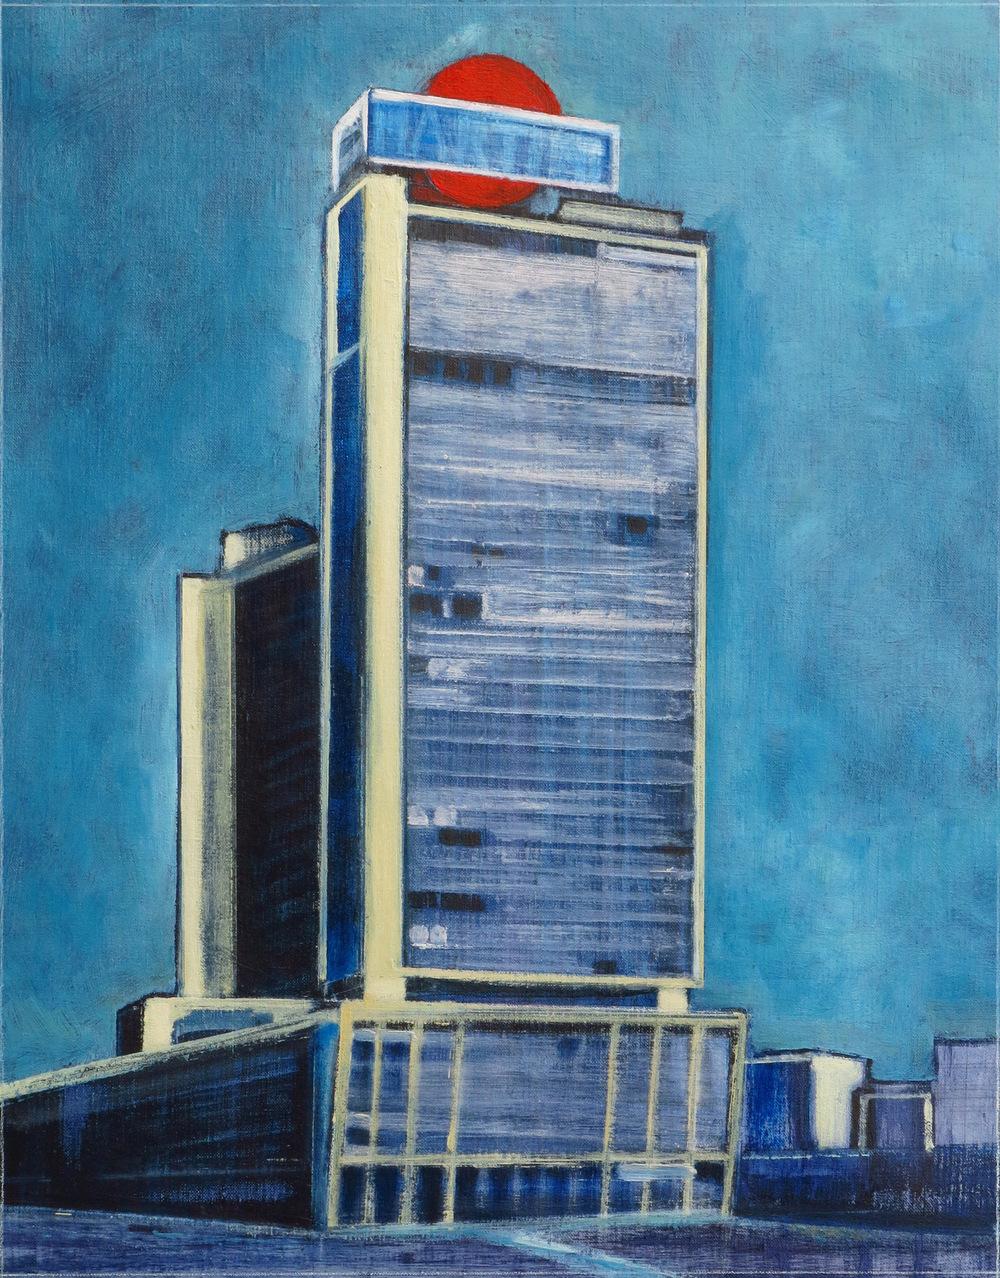 // Bruno Truyts // visual artist // - Modern building bxl - 54 X 70 cm - Acryl & oil on linnen - 2015